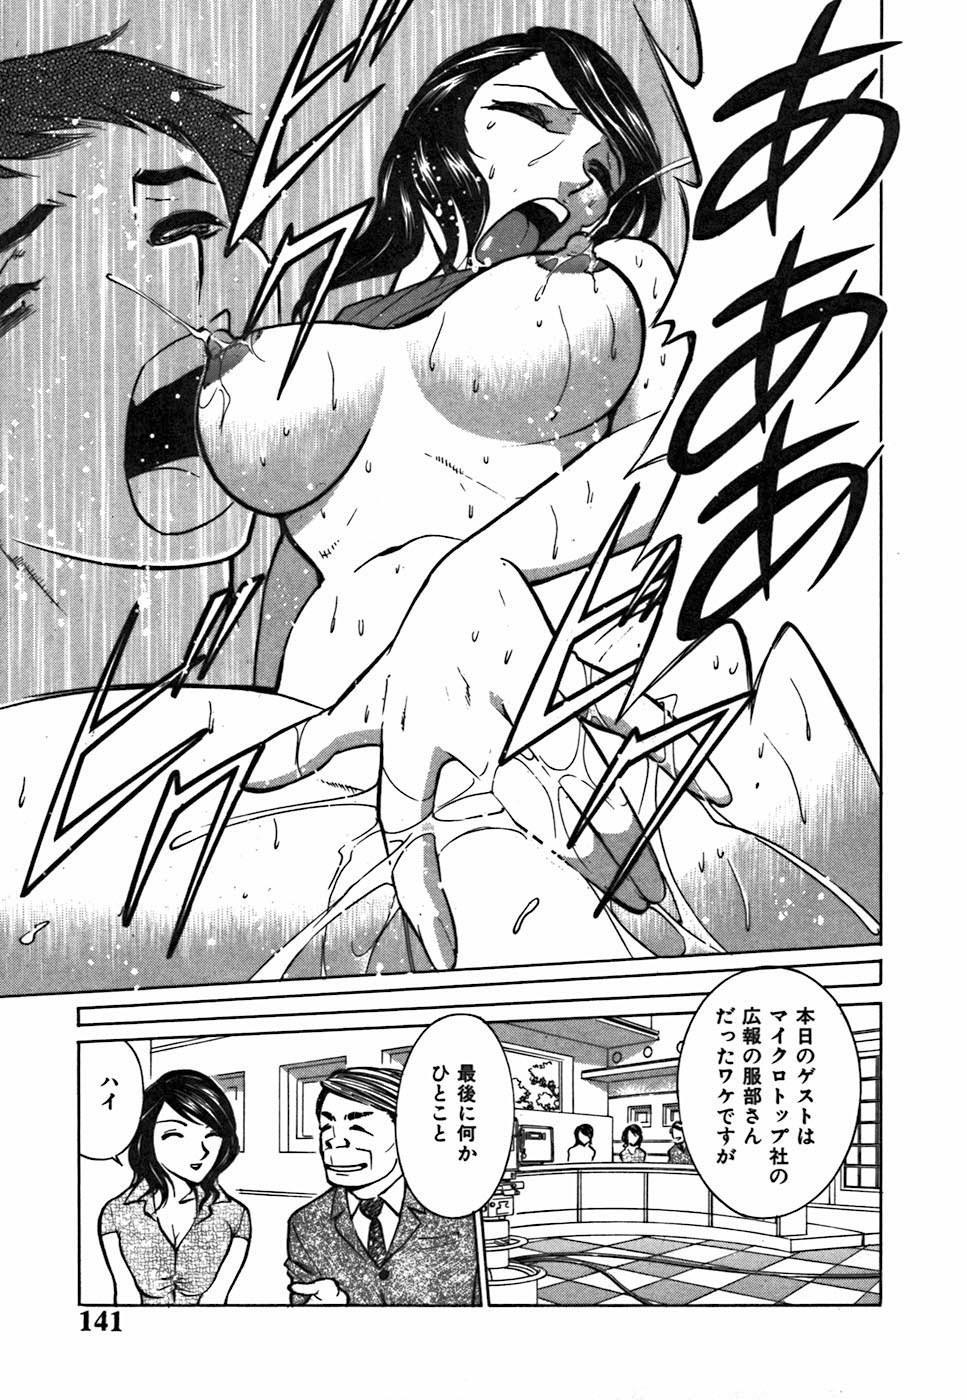 Kimi ga Nozomu Katachi | Appearance for which you hope 140